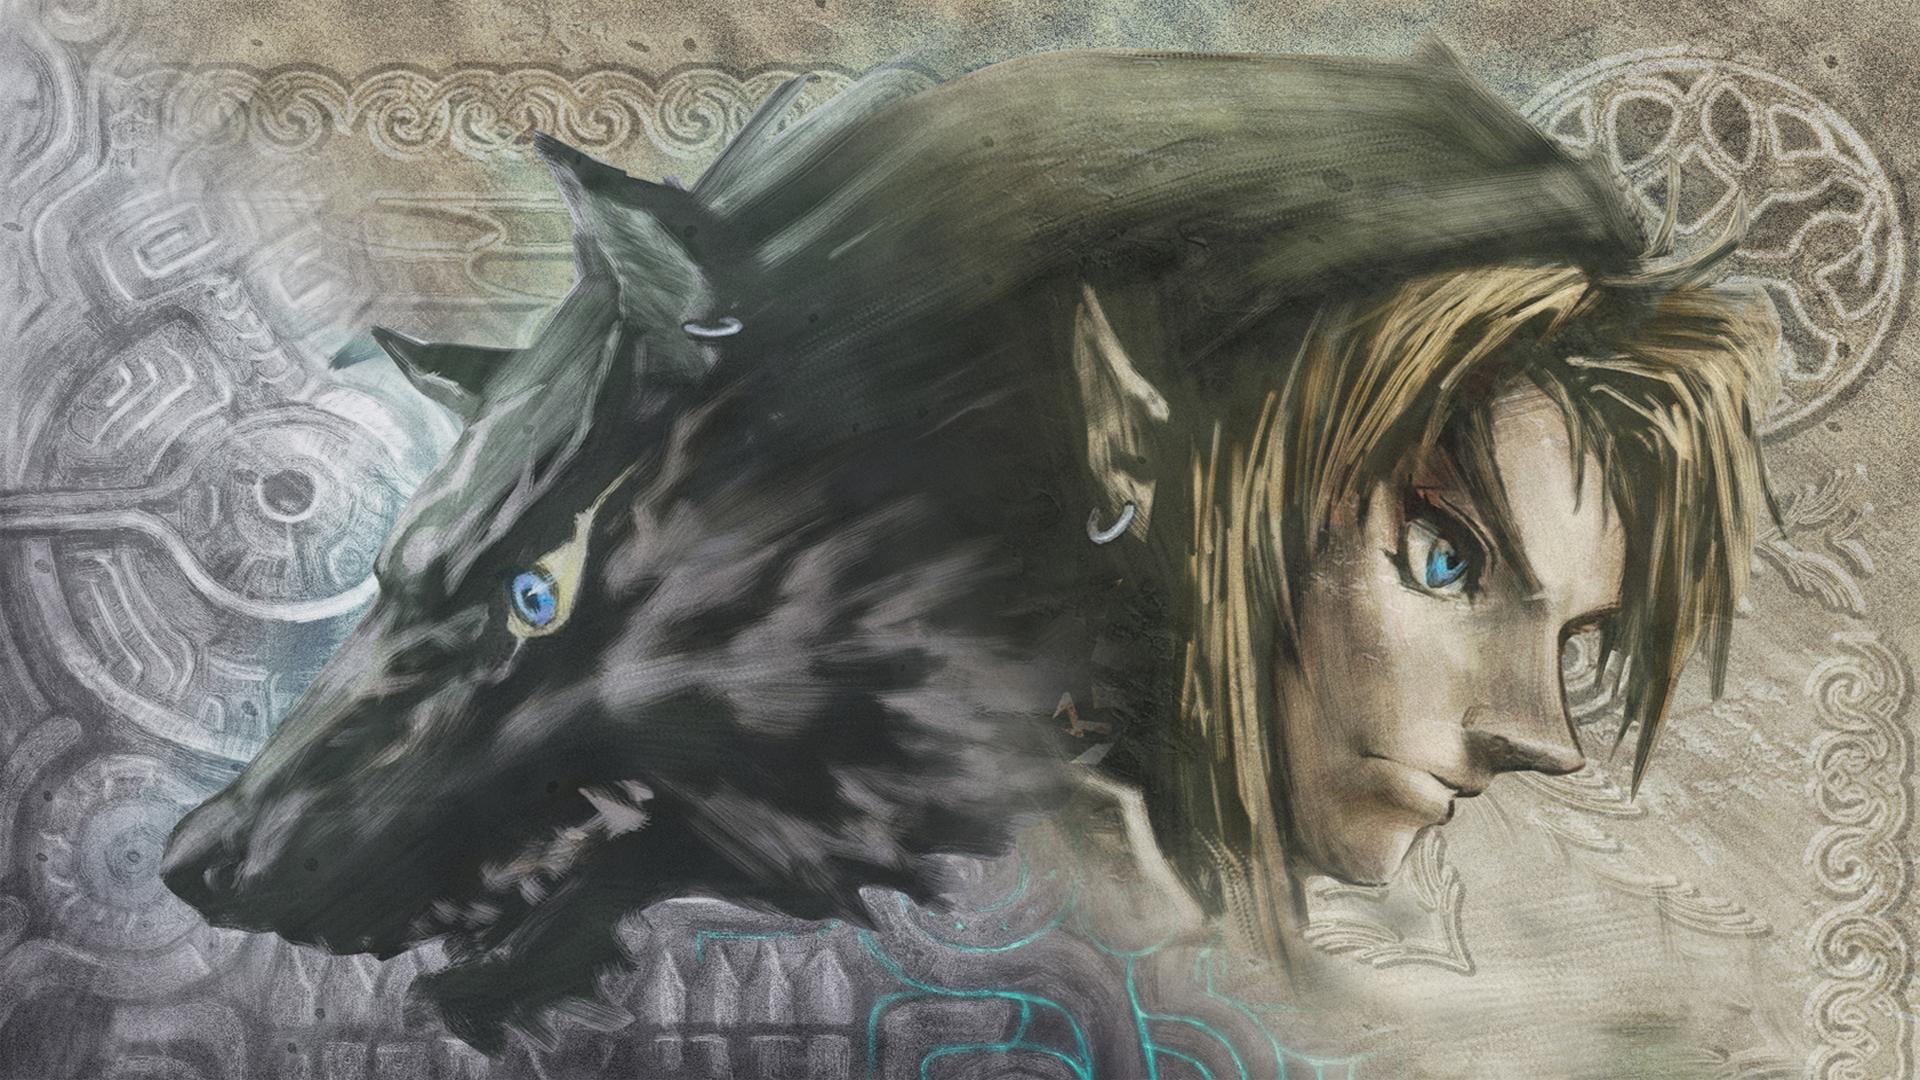 Link Wolf Wallpaper 1920x1080 Link Wolf The Legend Of Zelda 1920x1080